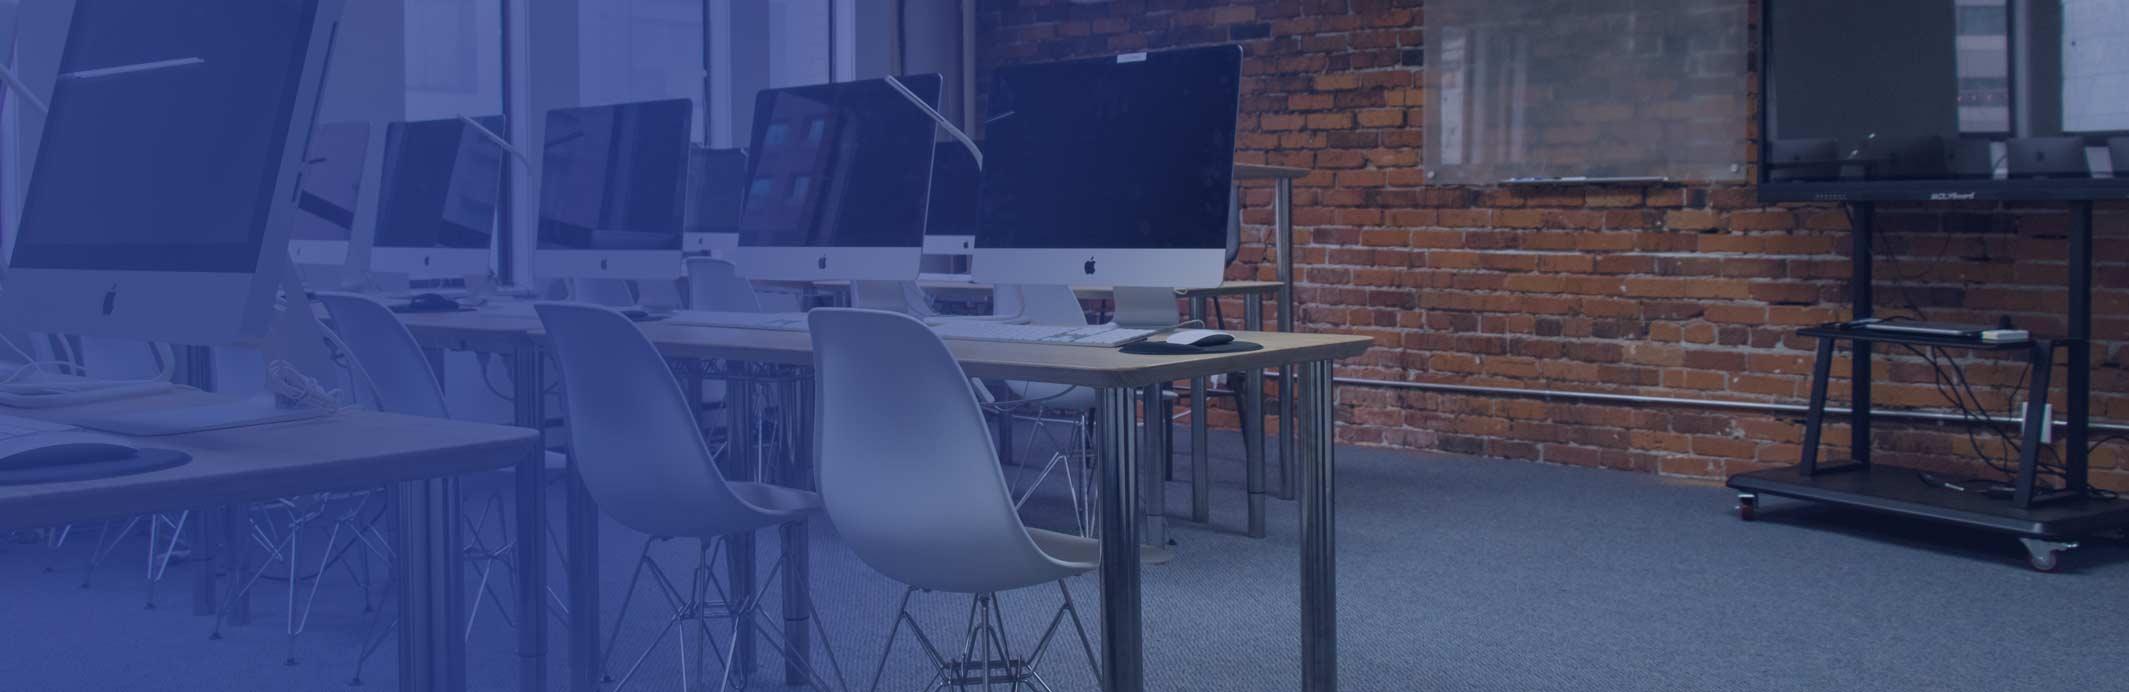 study digital marketing